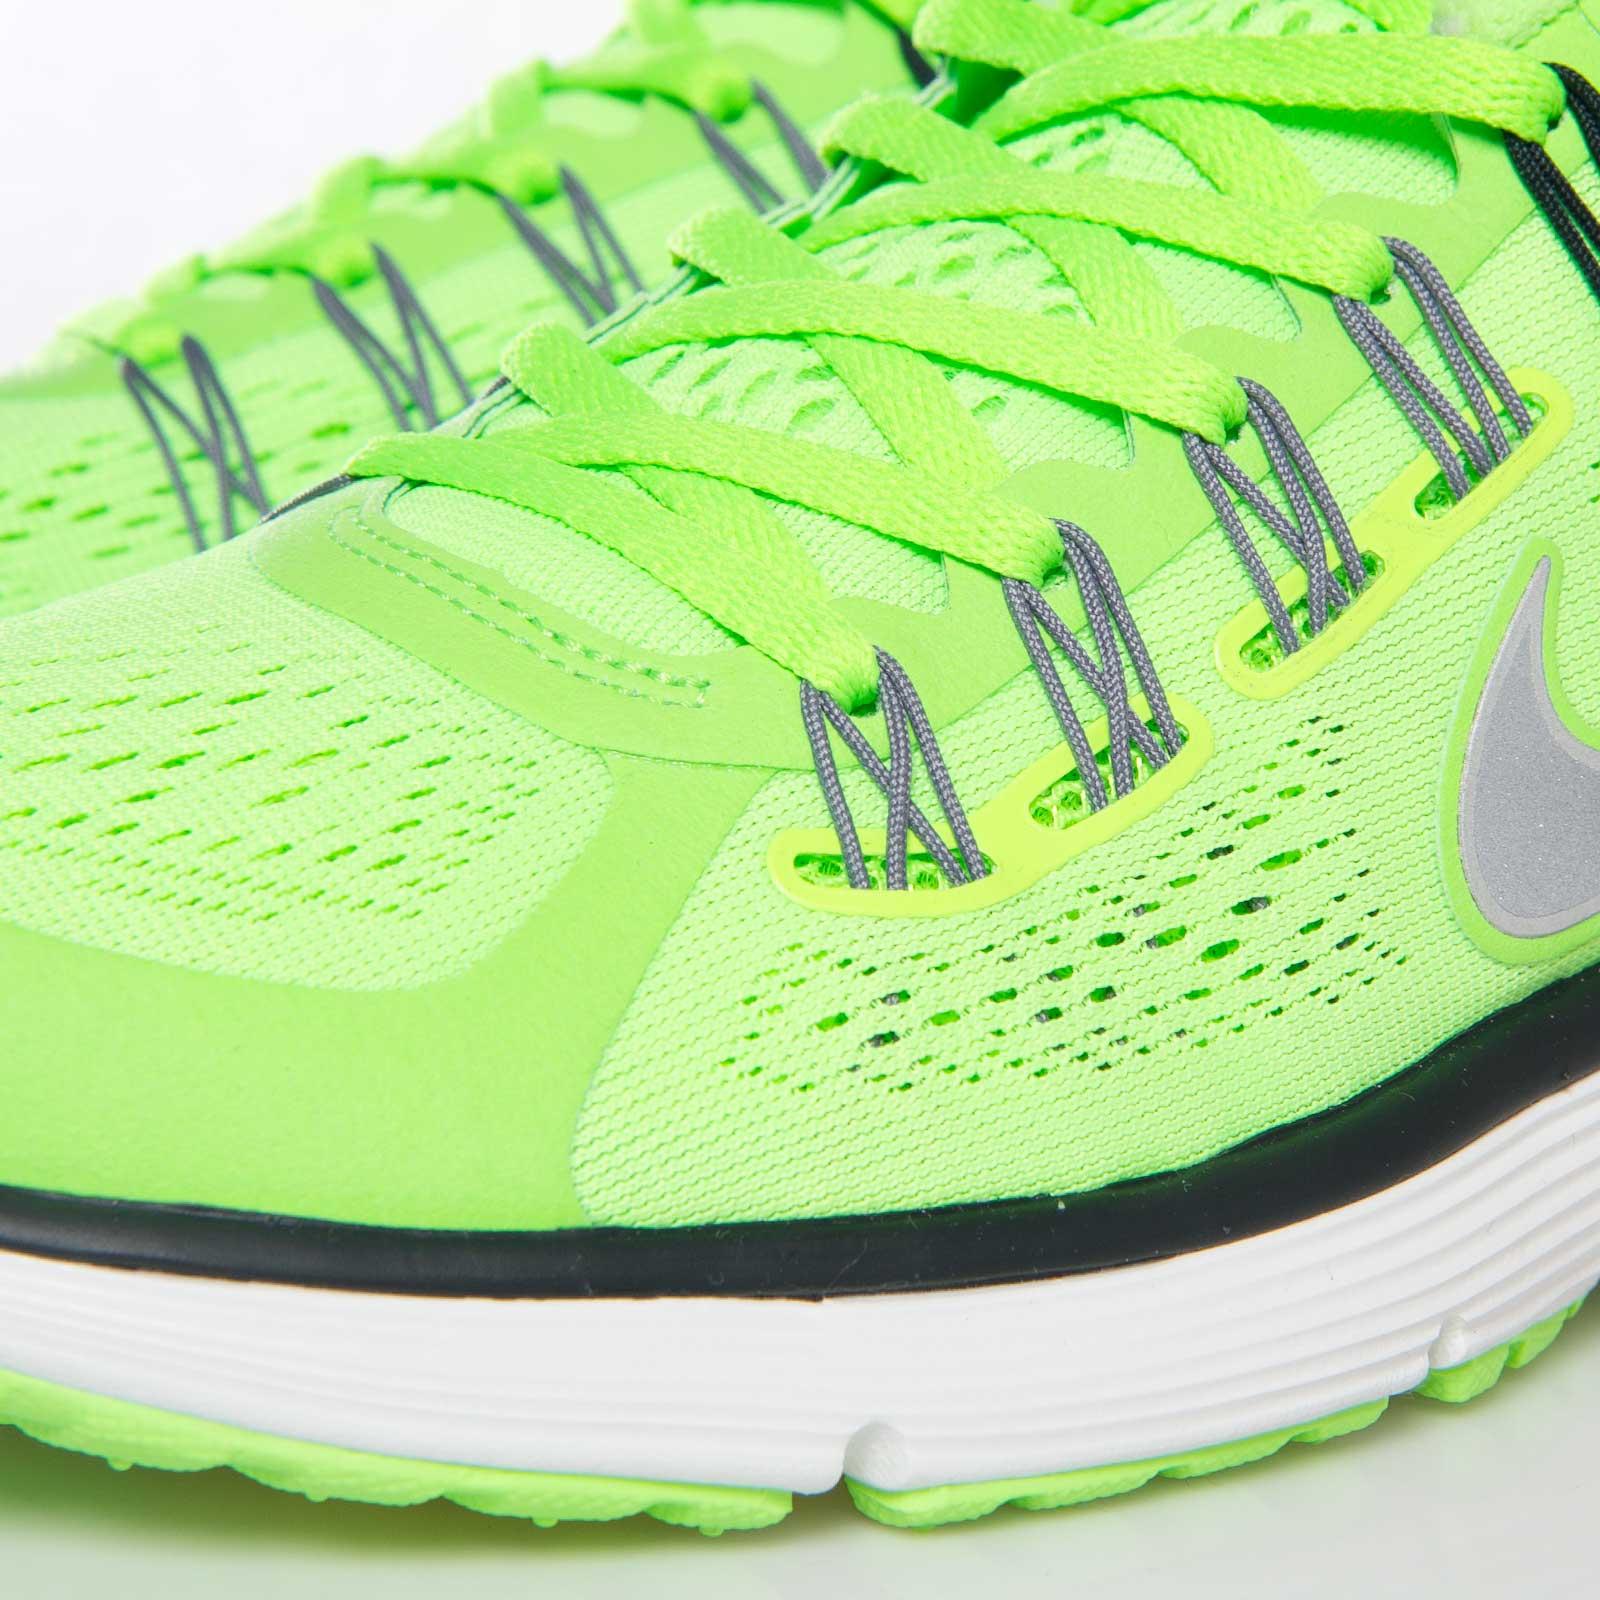 93fc10f402d24 Nike Lunareclipse +3 - 555337-303 - Sneakersnstuff